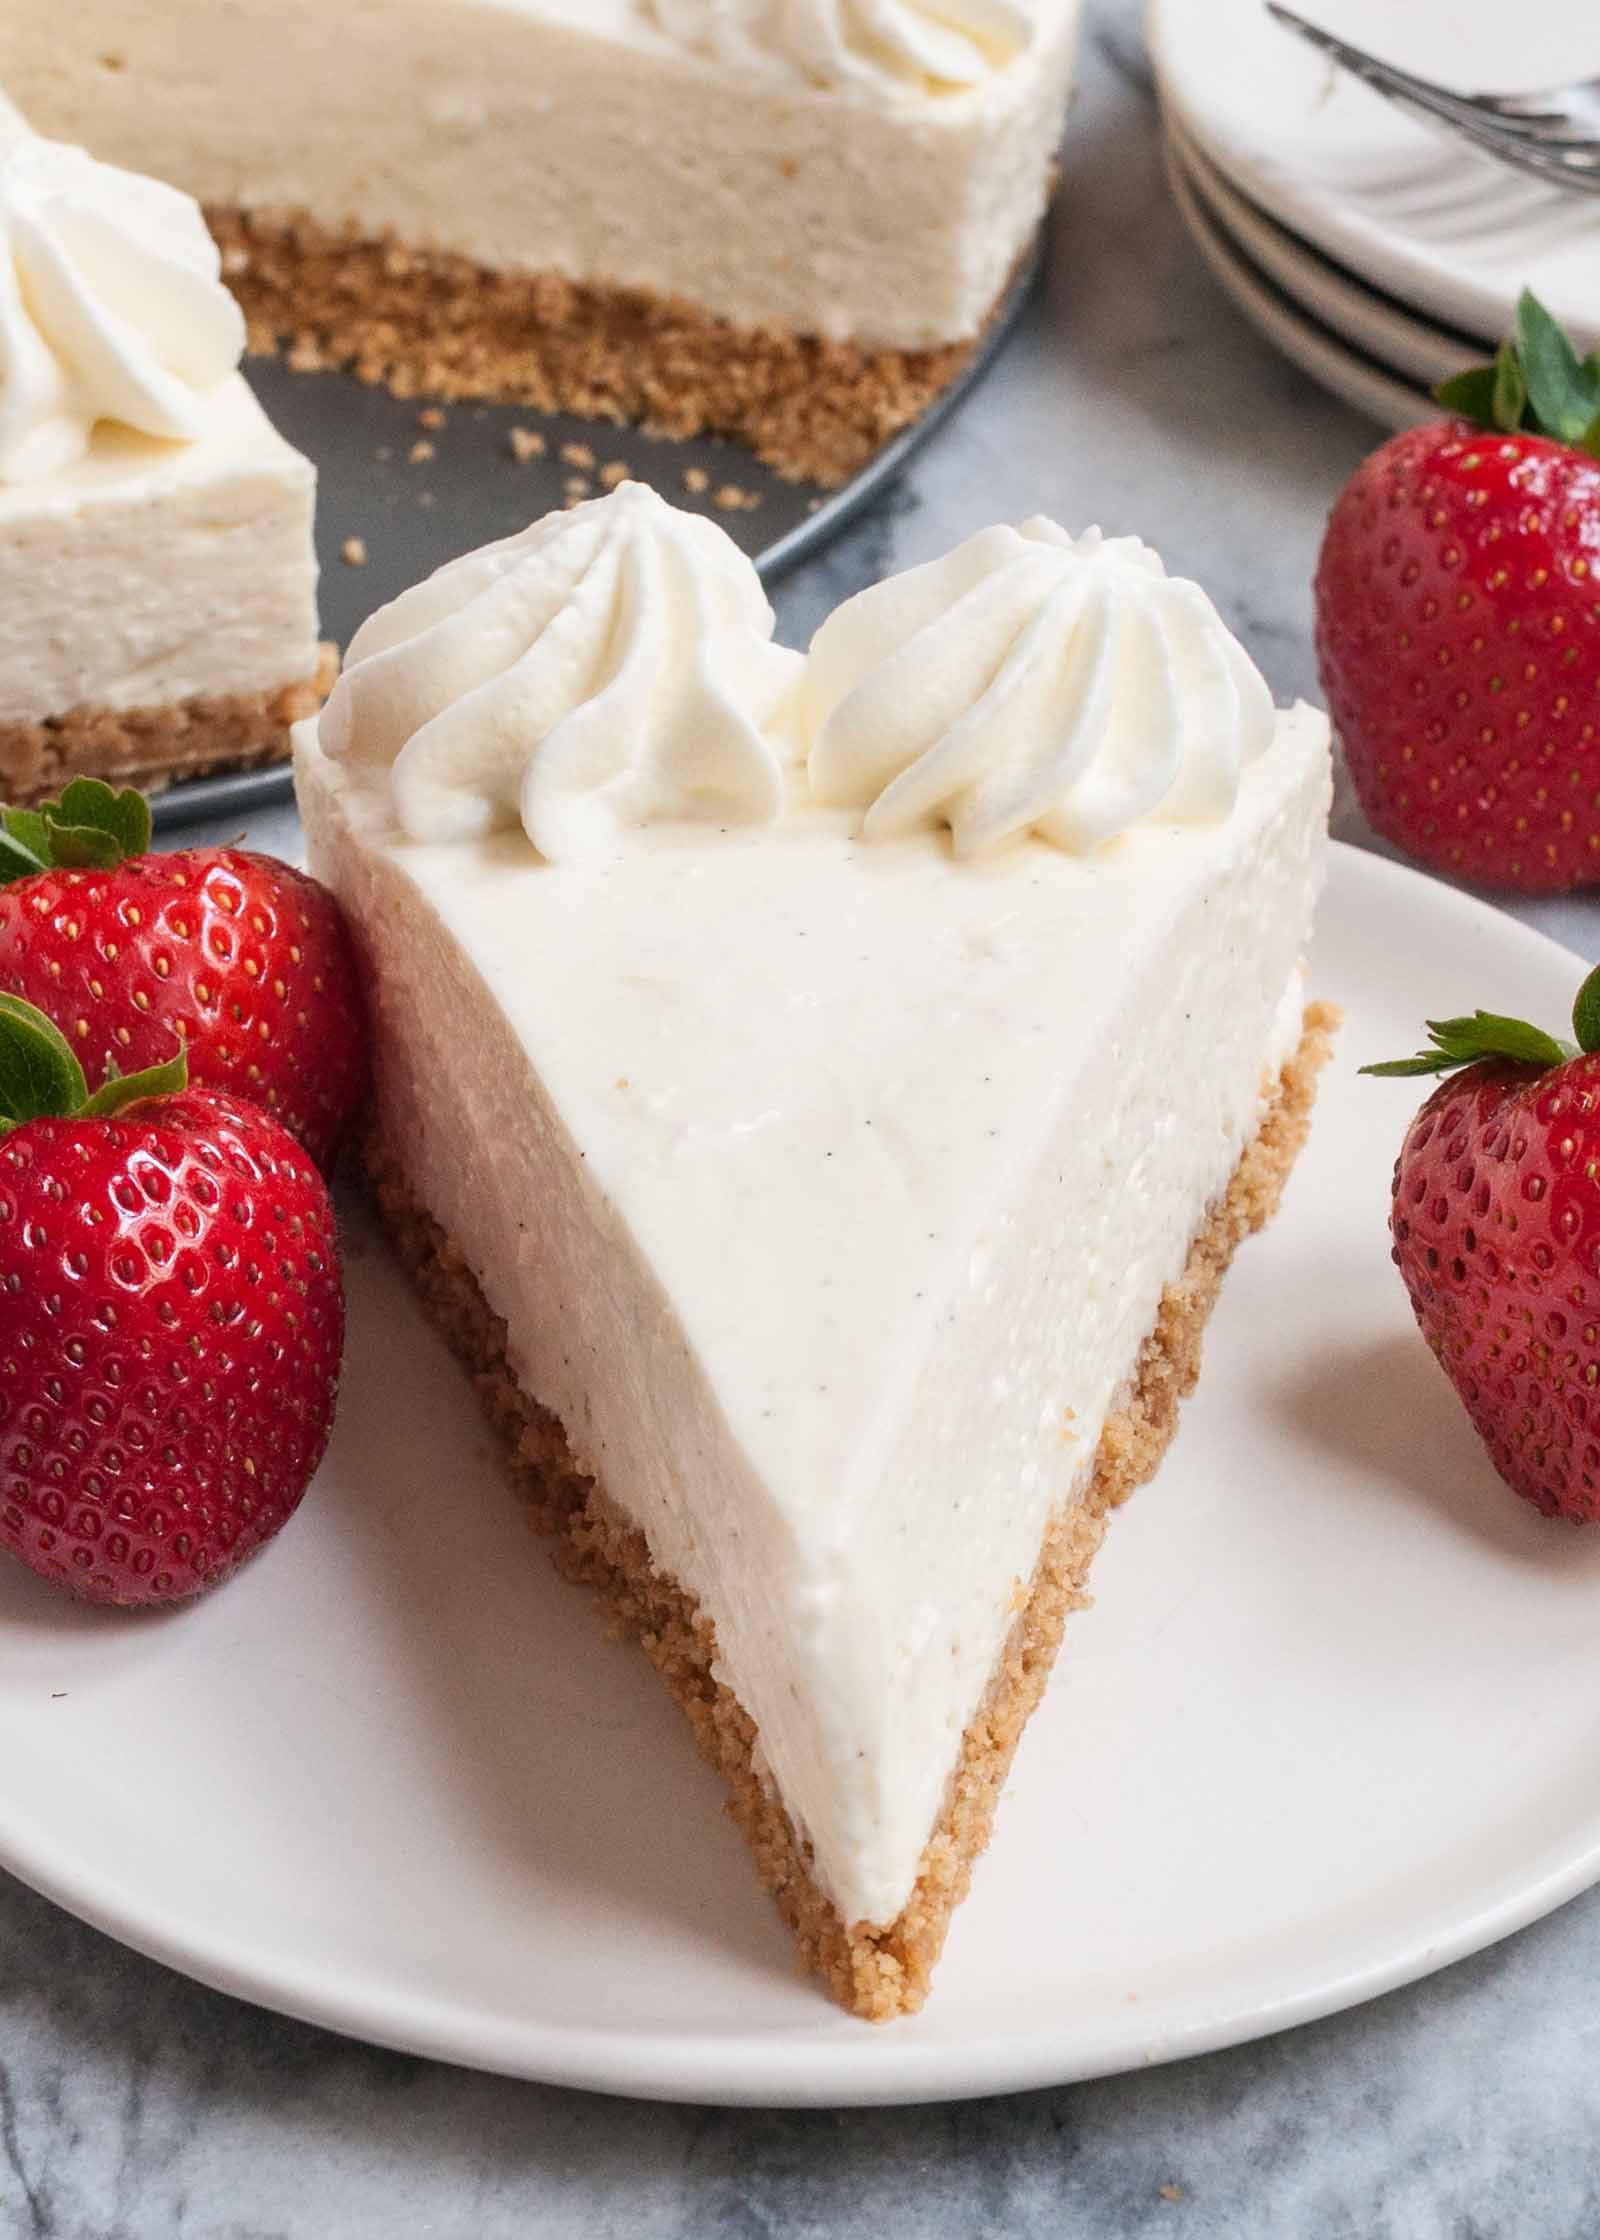 Cheesecake Recipe No Bake  No Bake Cheesecake So EASY